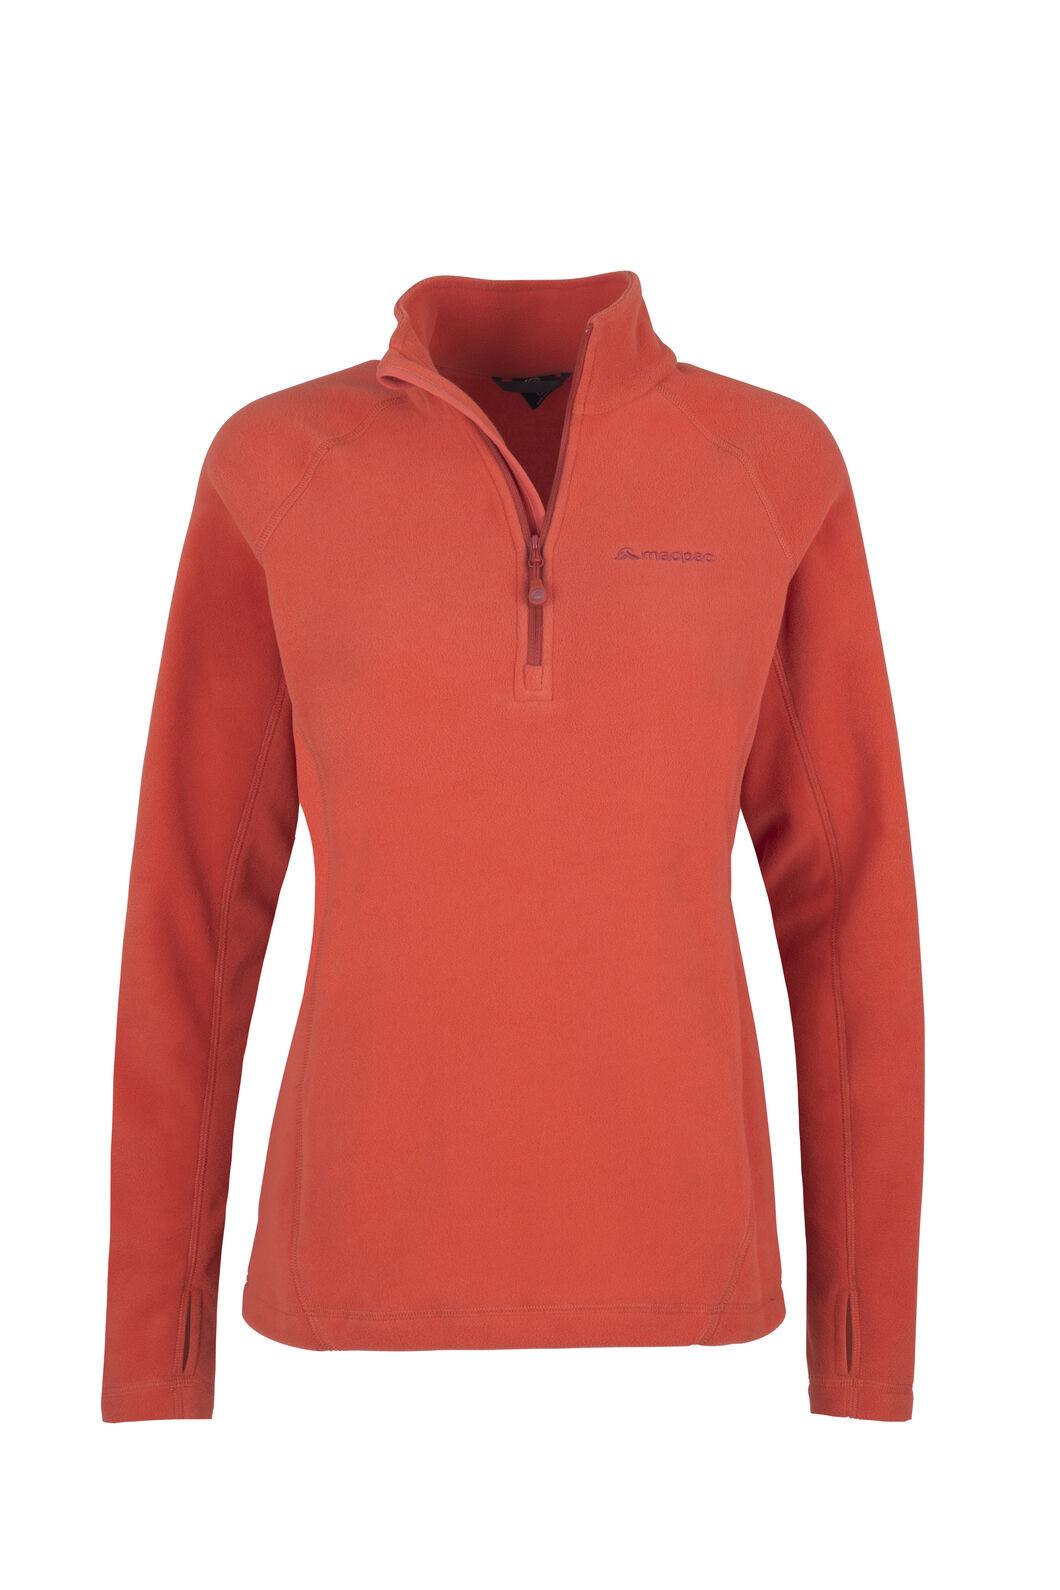 Macpac Tui Polartec® Micro Fleece® Pullover — Women's, Chilli, hi-res